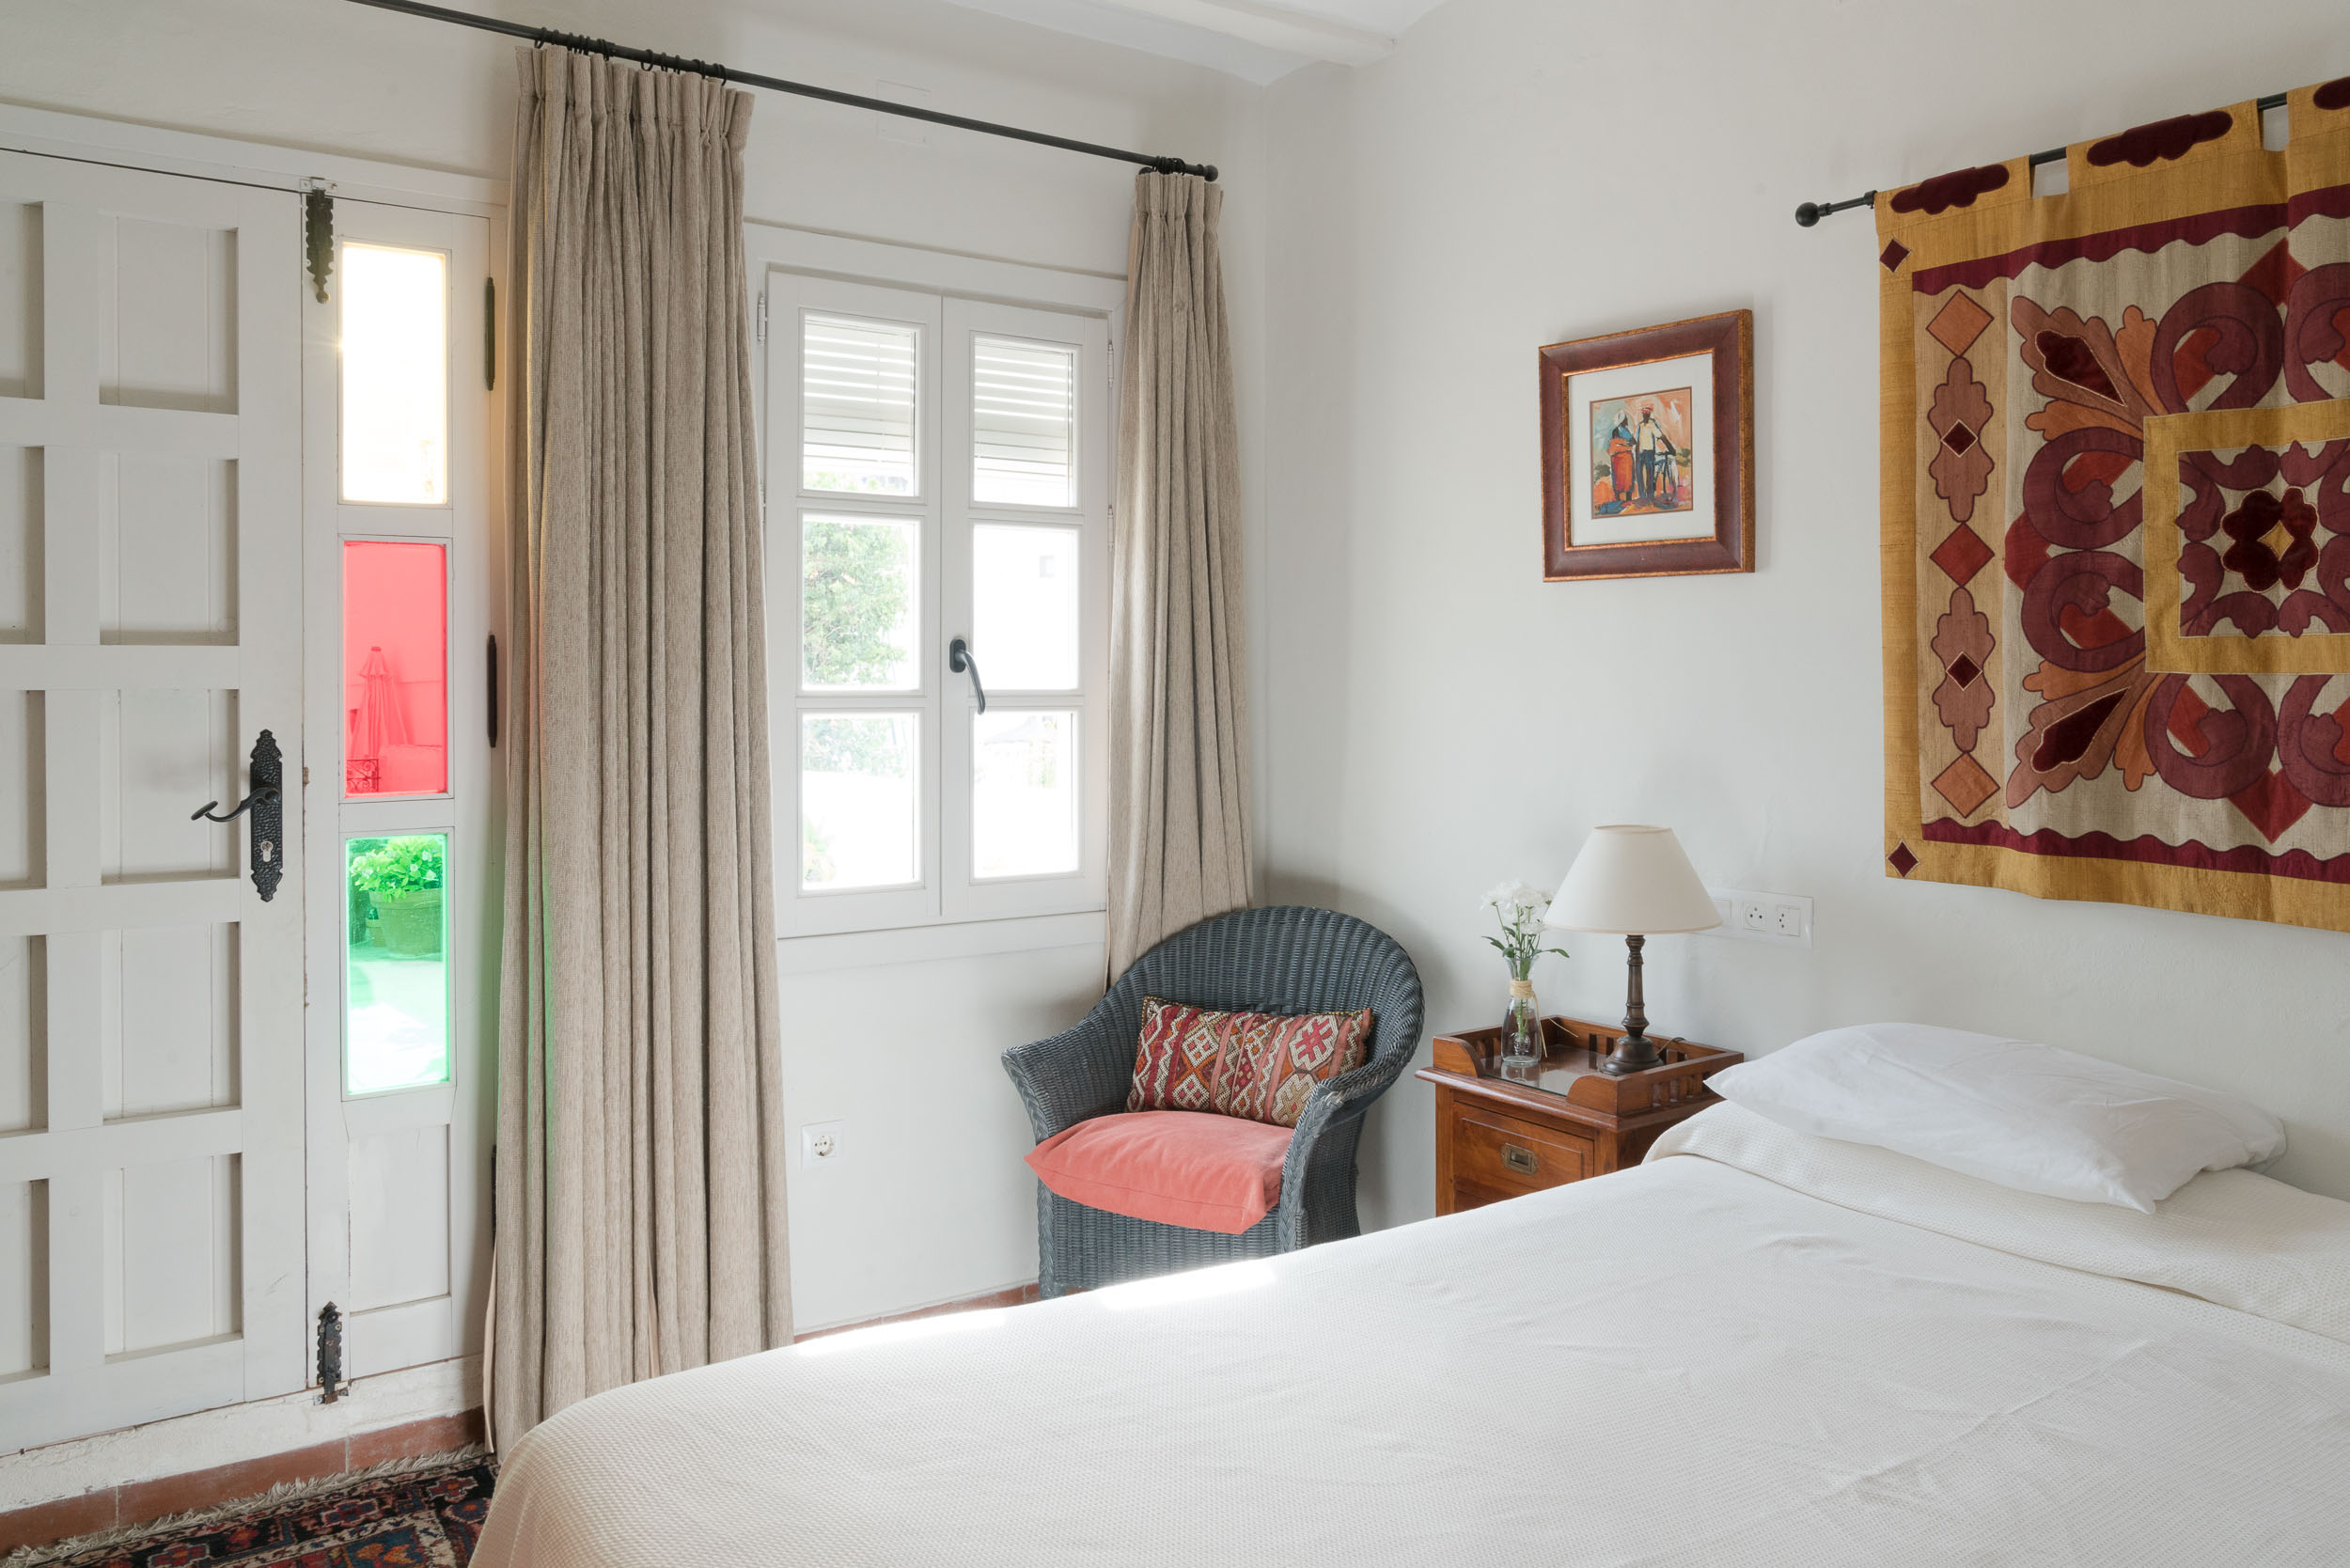 the_getaway_edit_hotel_casa_del_califa_vejer_de_la_frontera-3.jpg